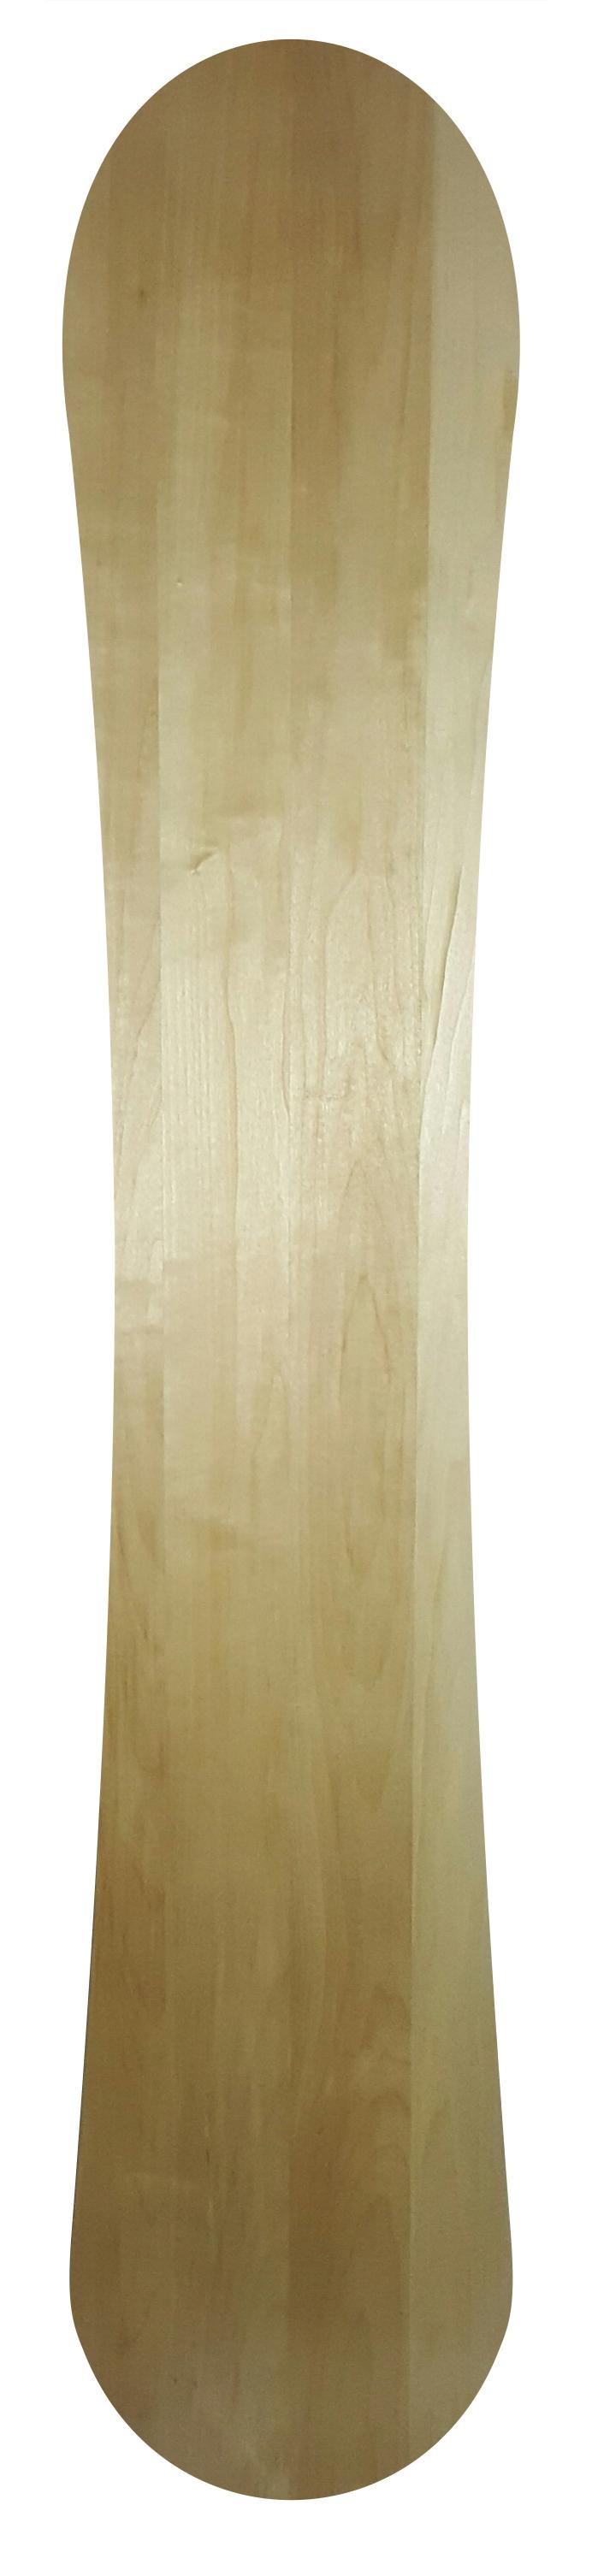 Wood Snowboard Bottom.jpg